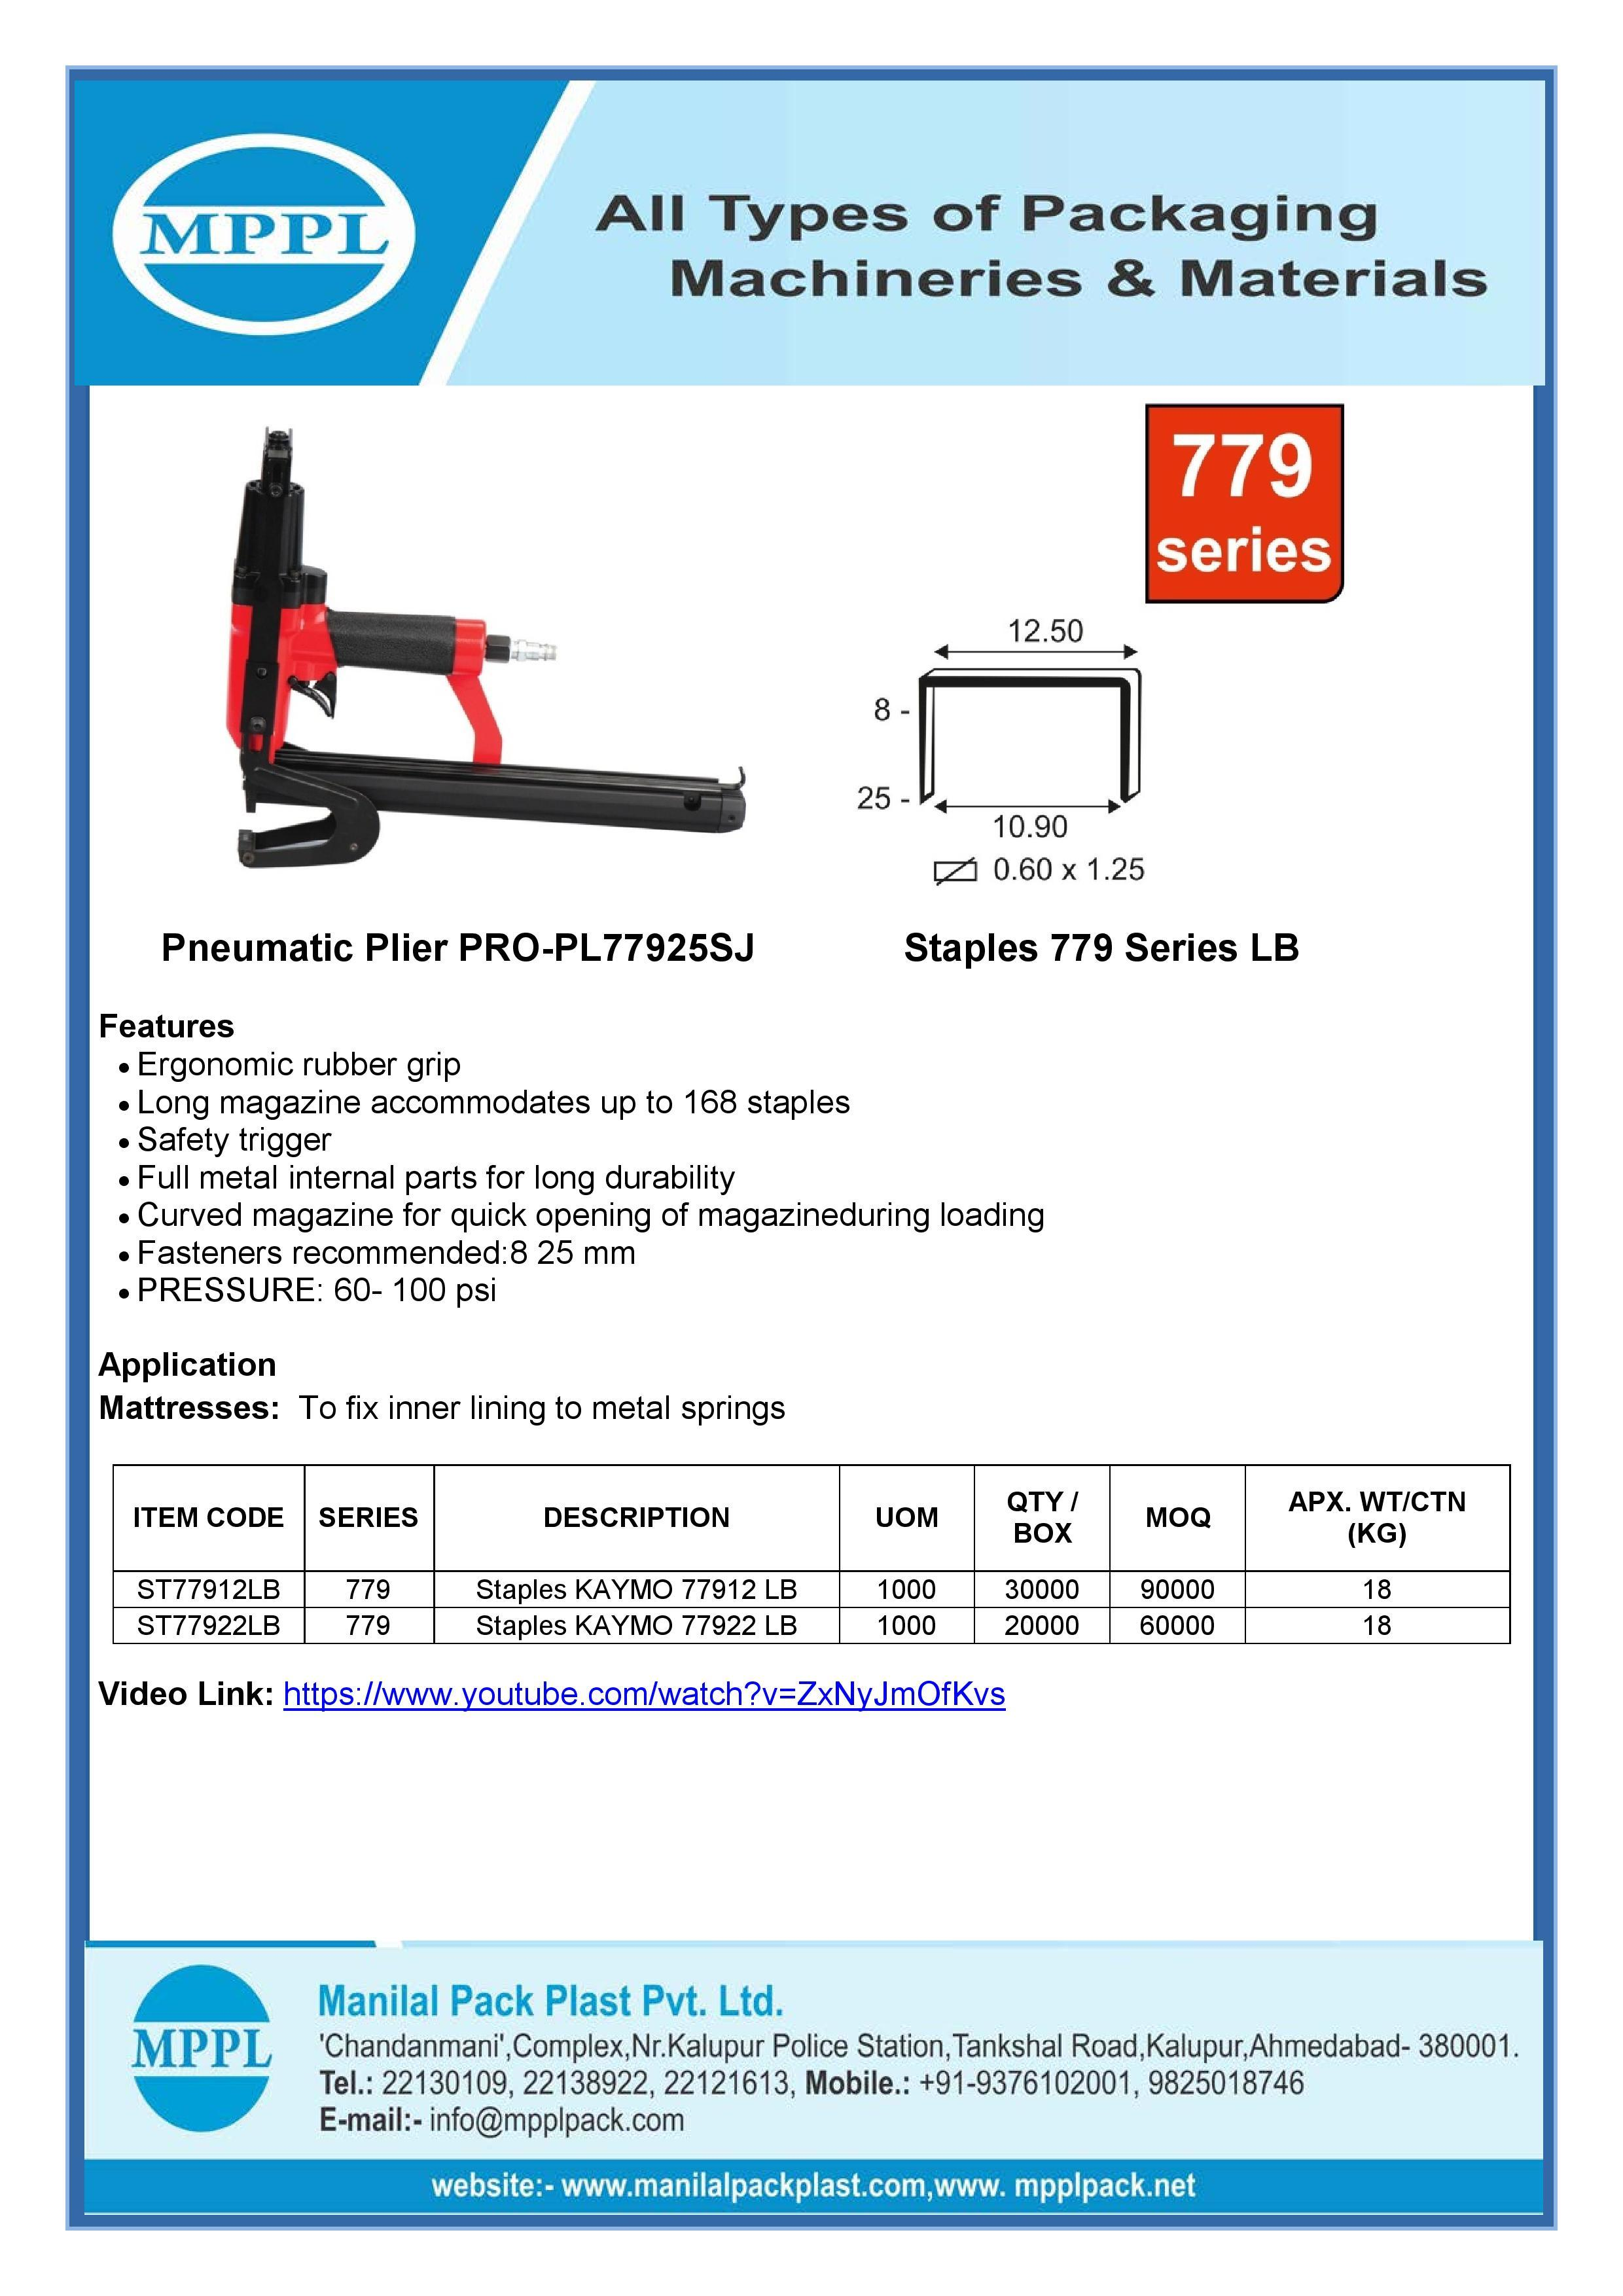 Pneumatic Plier PRO-PL77925SJ